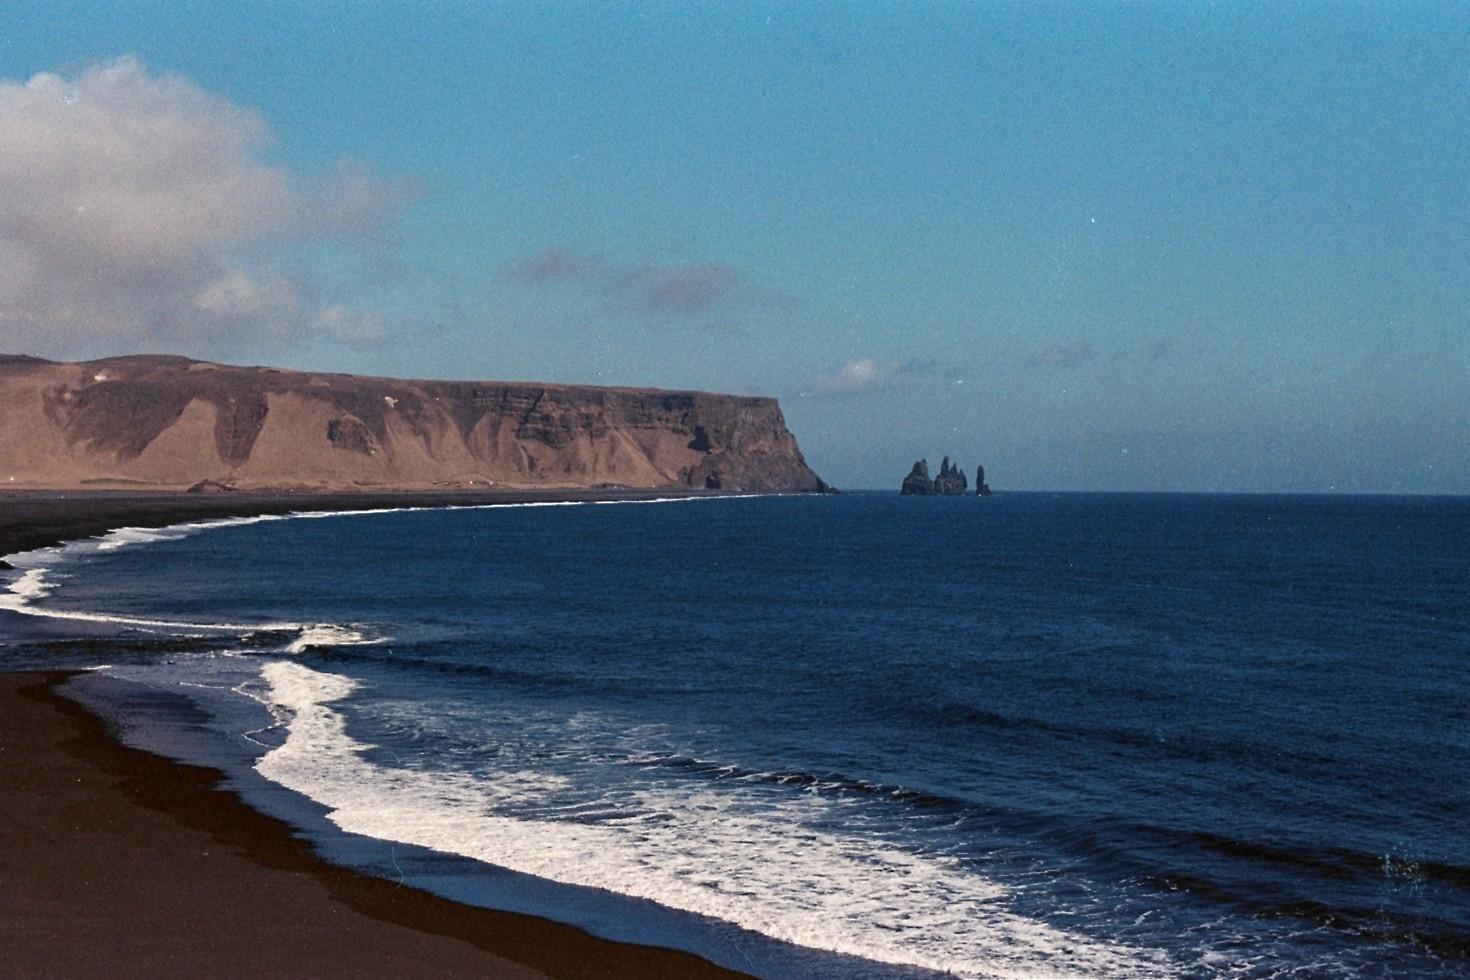 Reynisfjara black beach - 35mm Canon AE-1 - Kodak Ektar 100